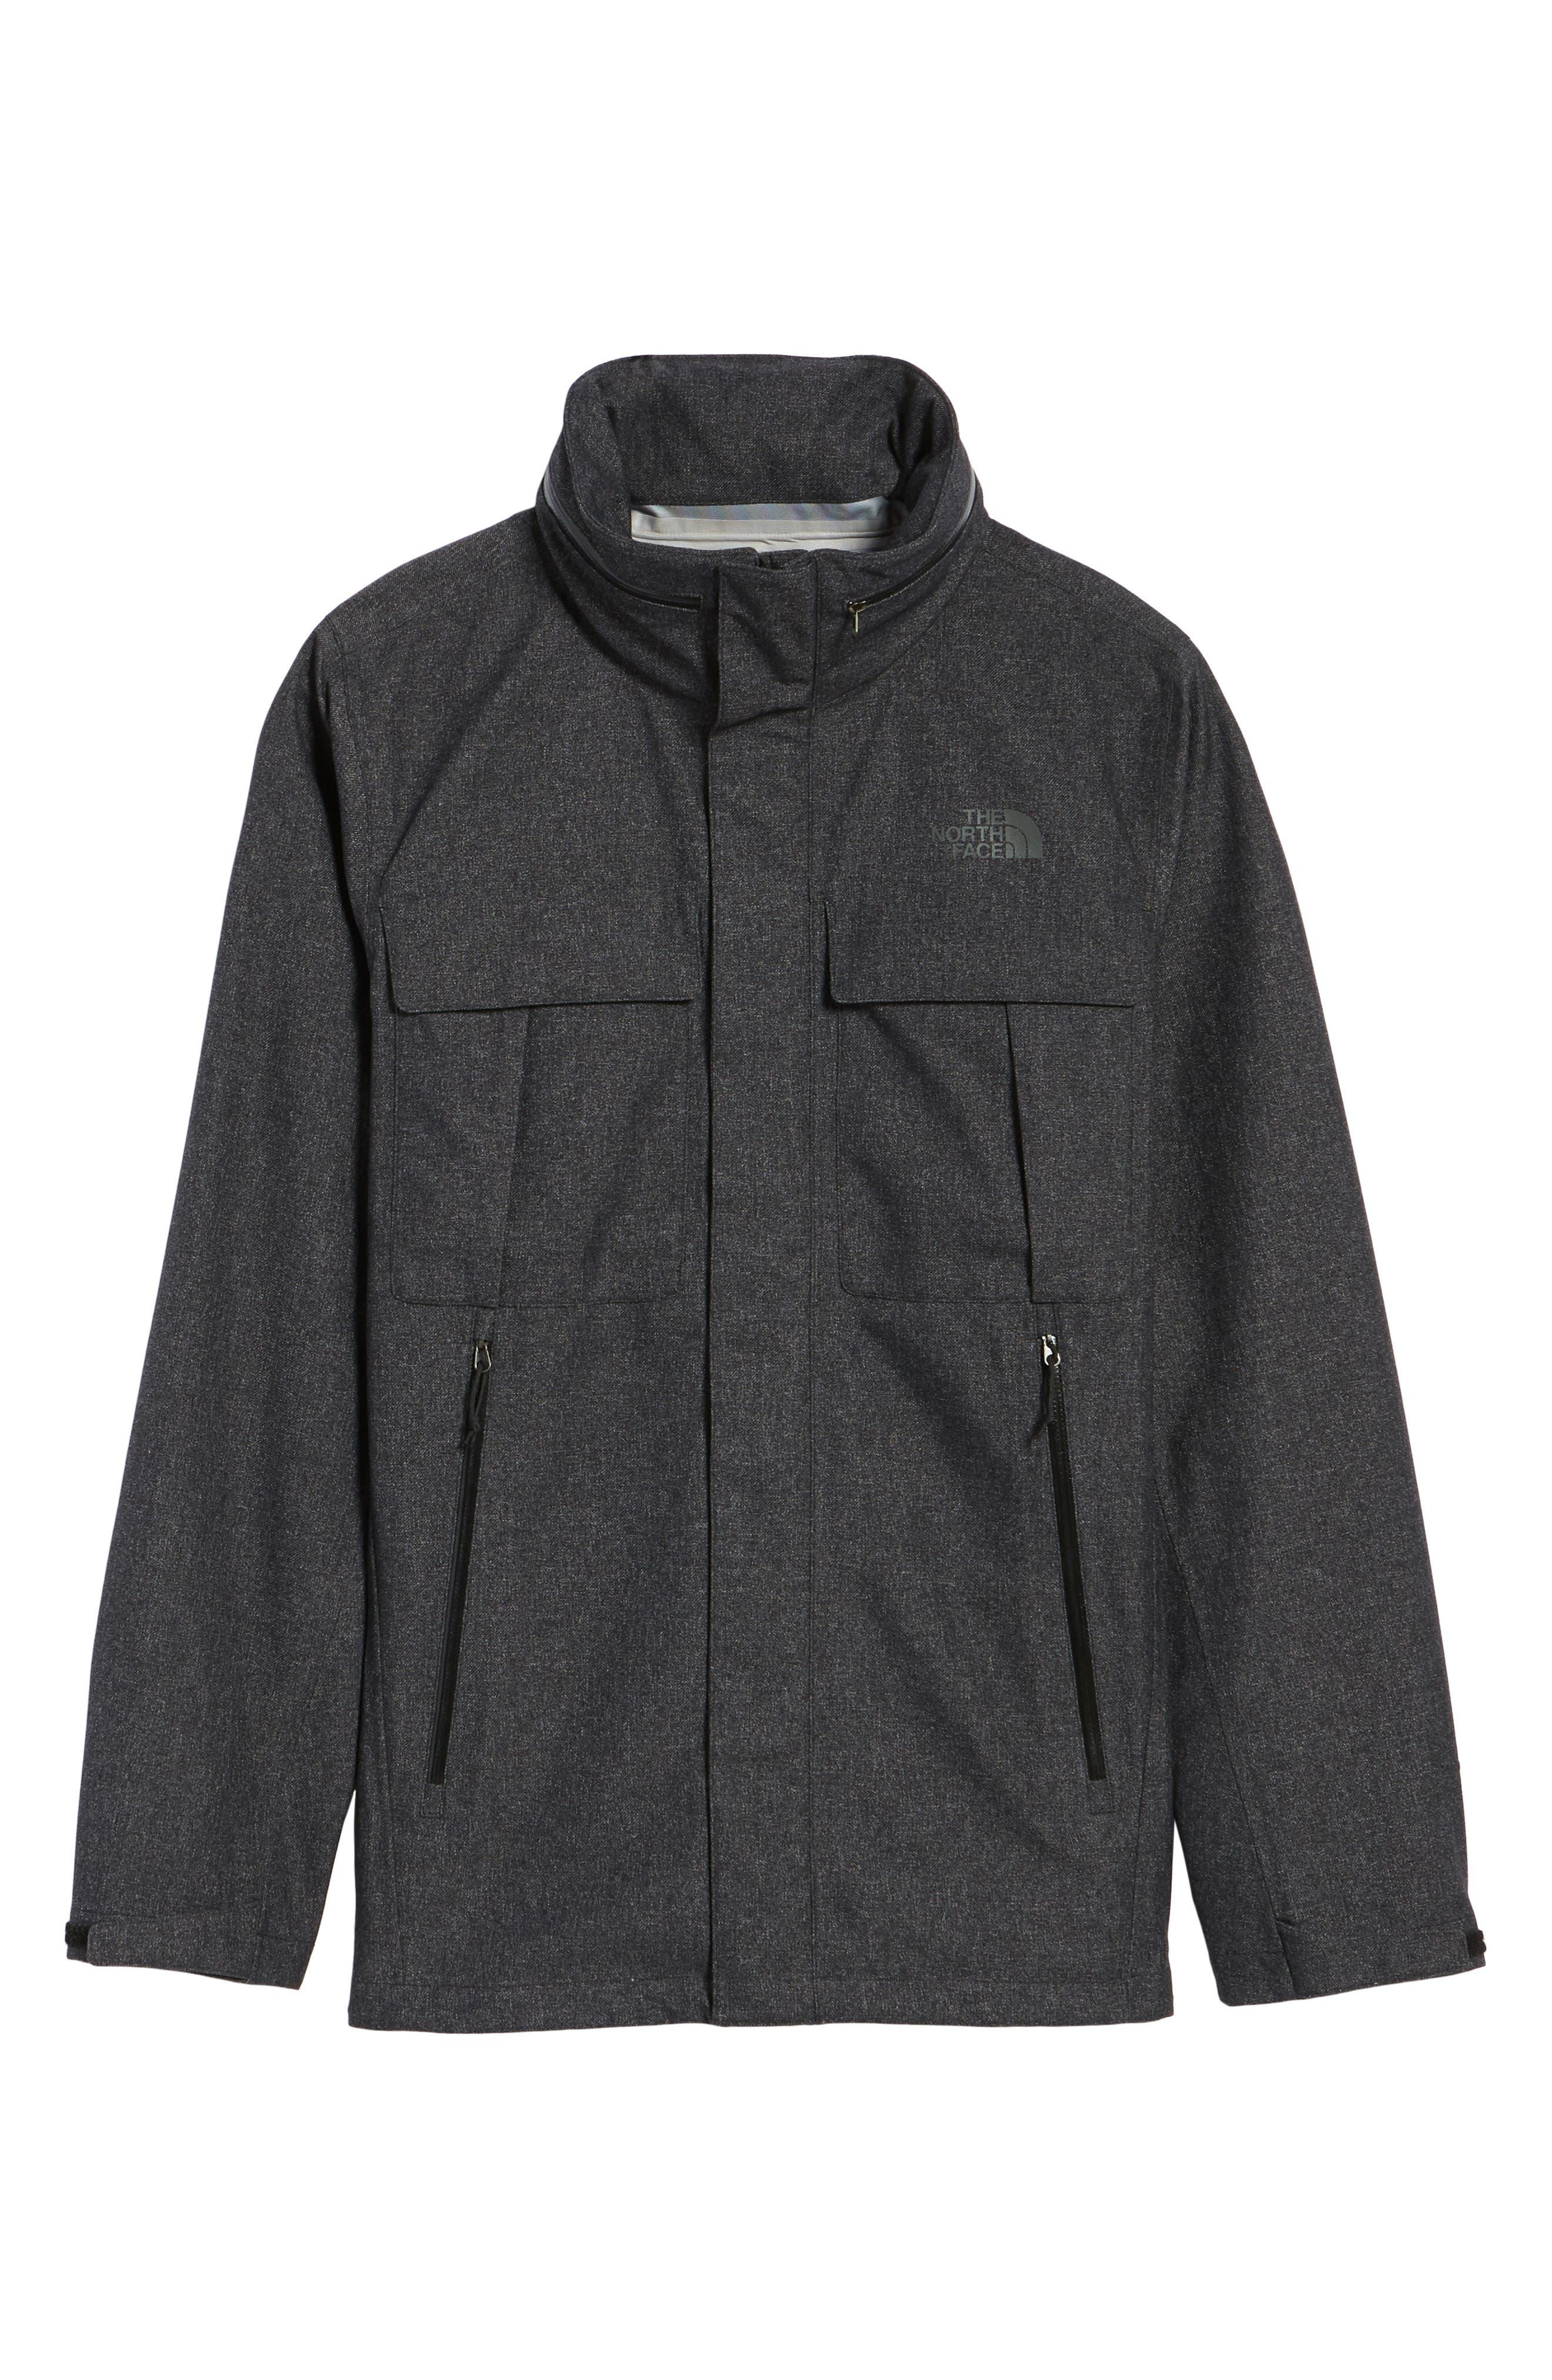 Kassler DryVent Field Jacket,                             Alternate thumbnail 5, color,                             001